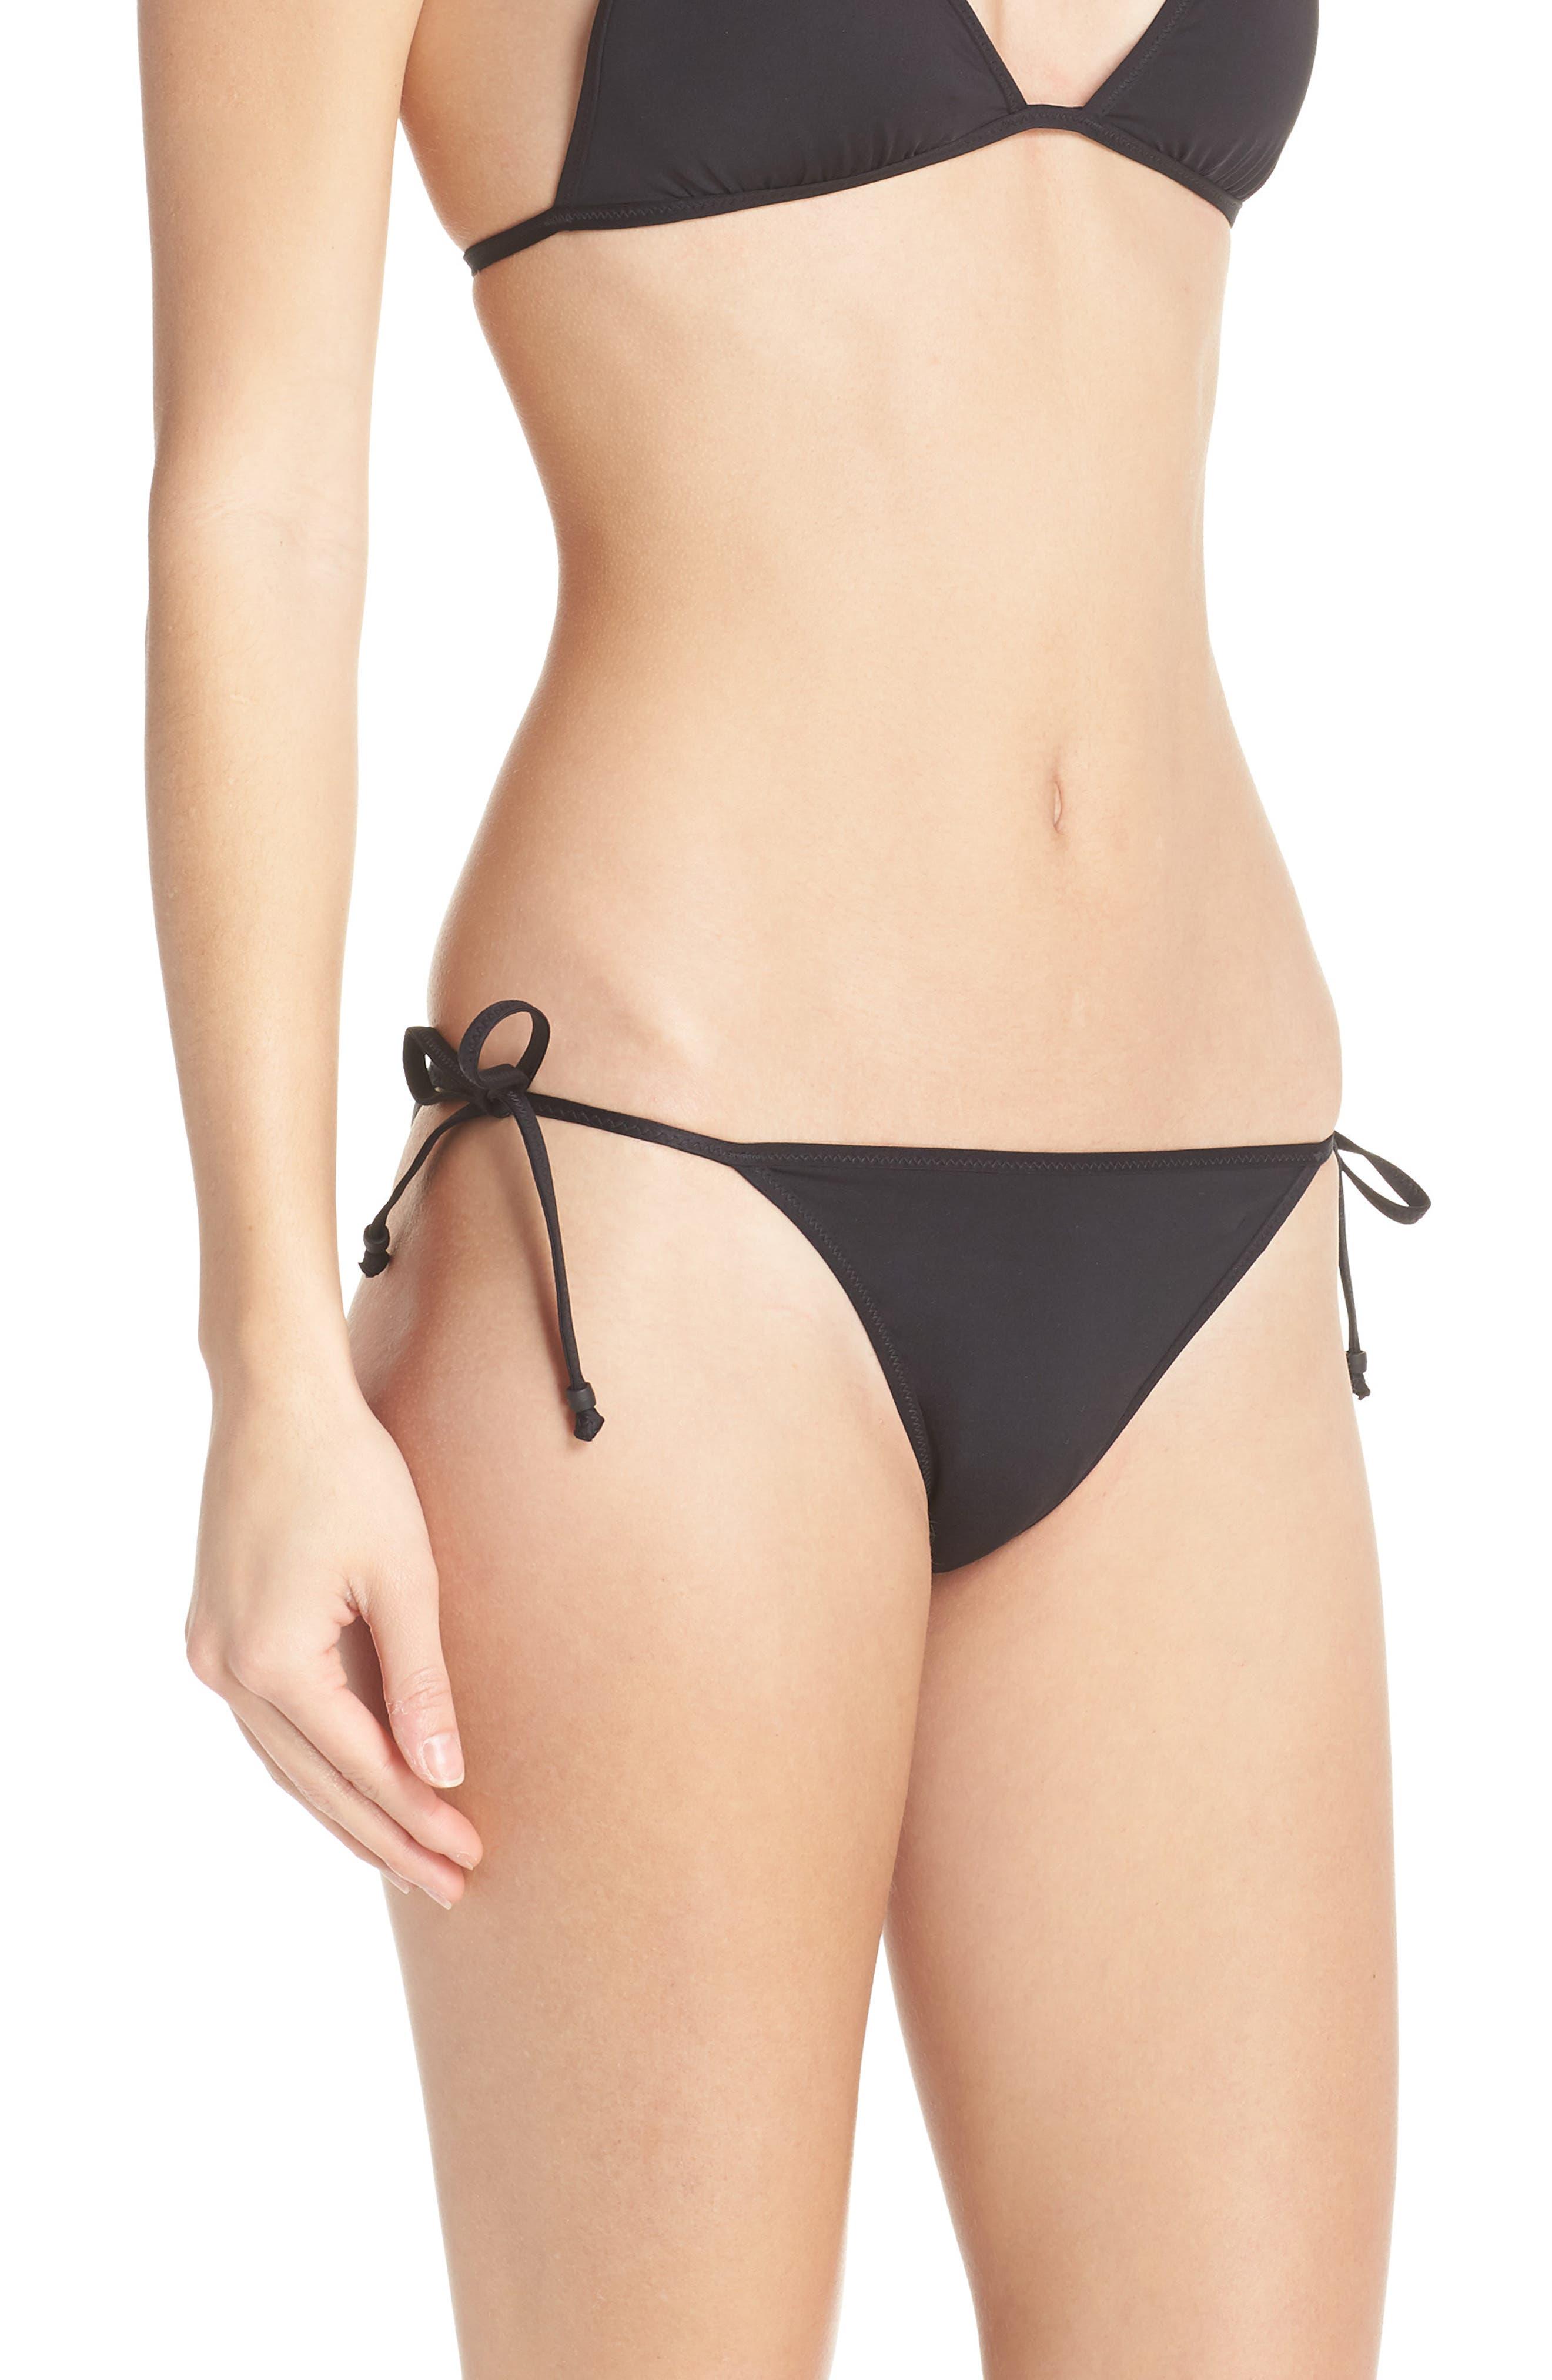 Playa Miami String Bikini Bottoms,                             Alternate thumbnail 3, color,                             001